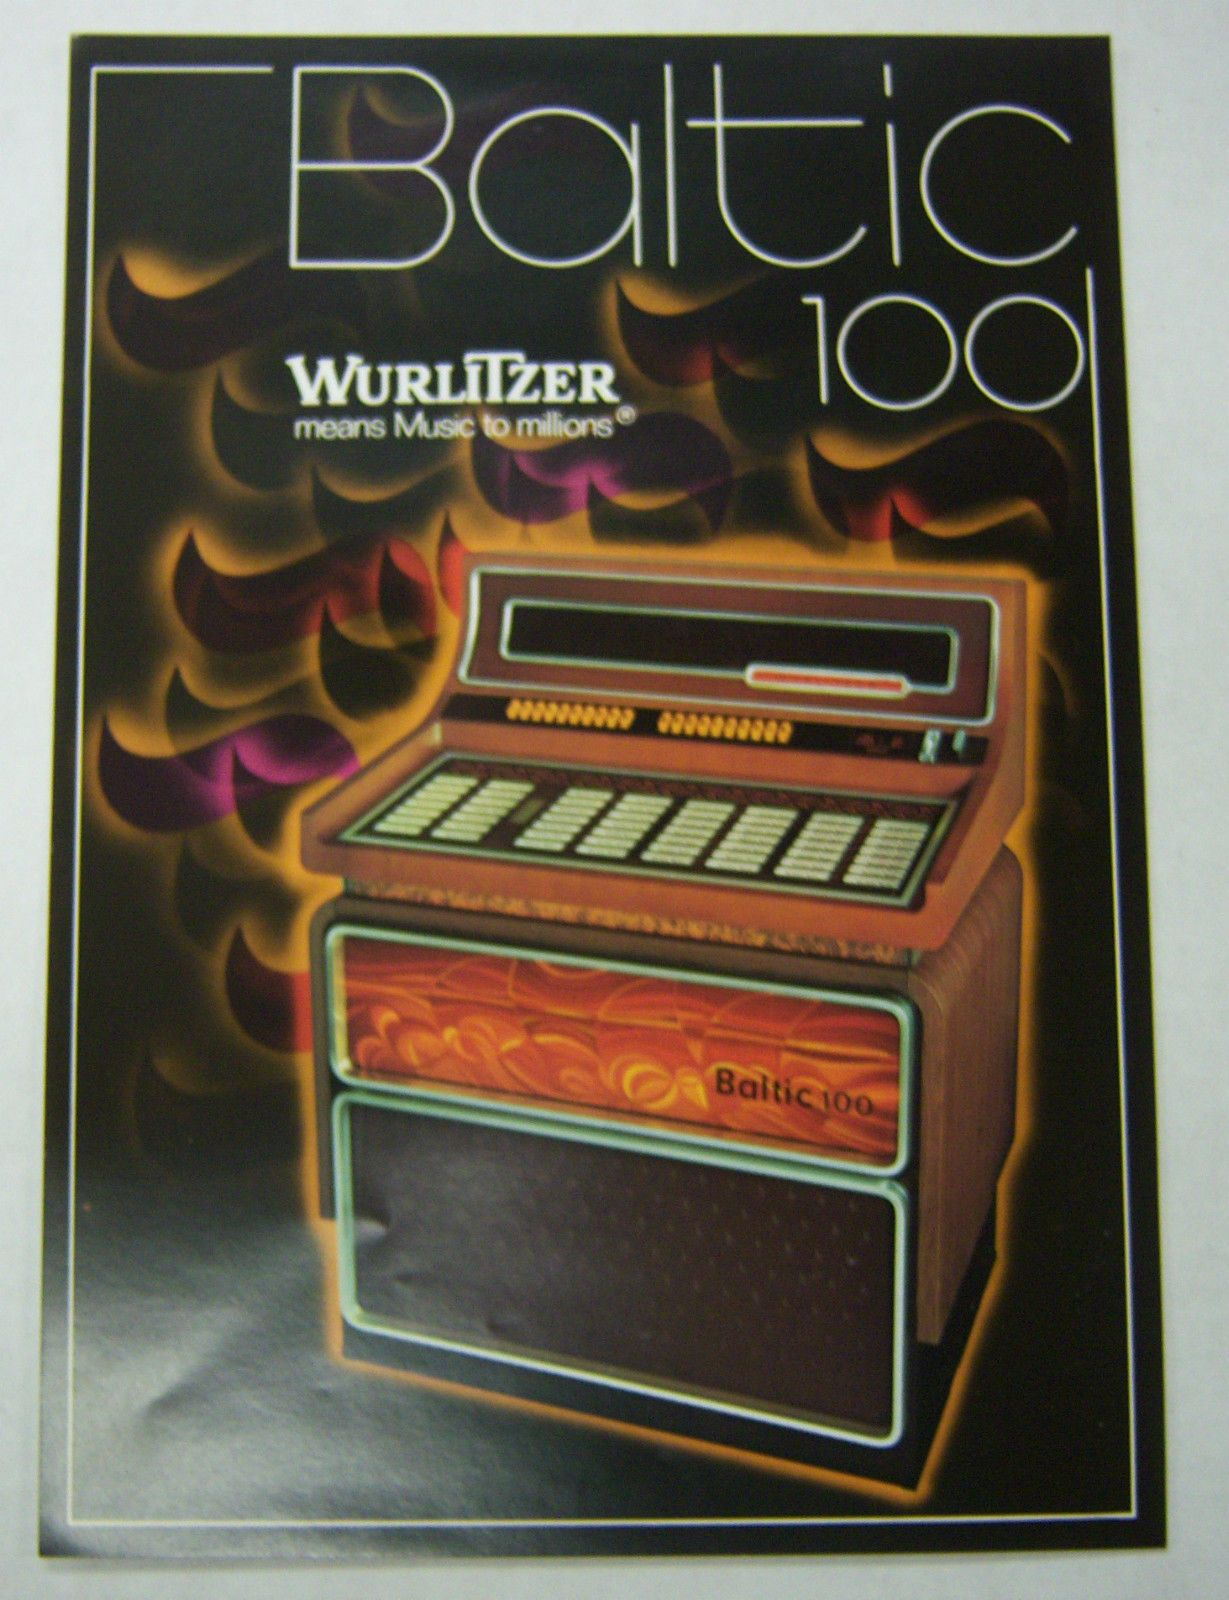 Wurlitzer+Jukebox+Price+Guide   ... 1970s Jukebox Advertising Brochure for